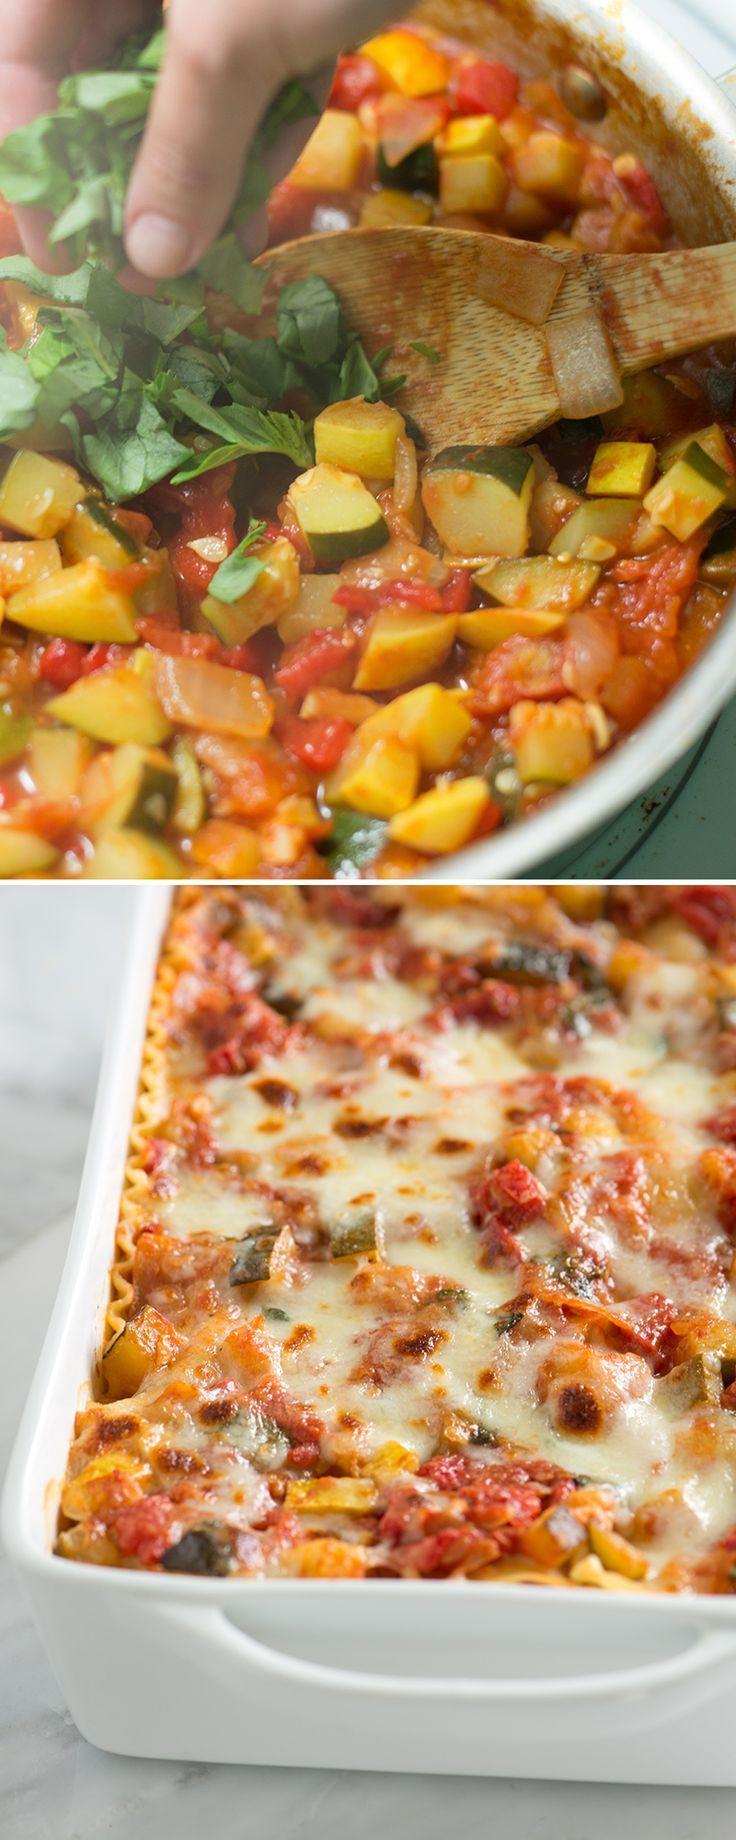 Easy Vegetable Lasagna Recipe Vegetable Lasagna Recipes Easy Vegetable Lasagna Vegetable Lasagna